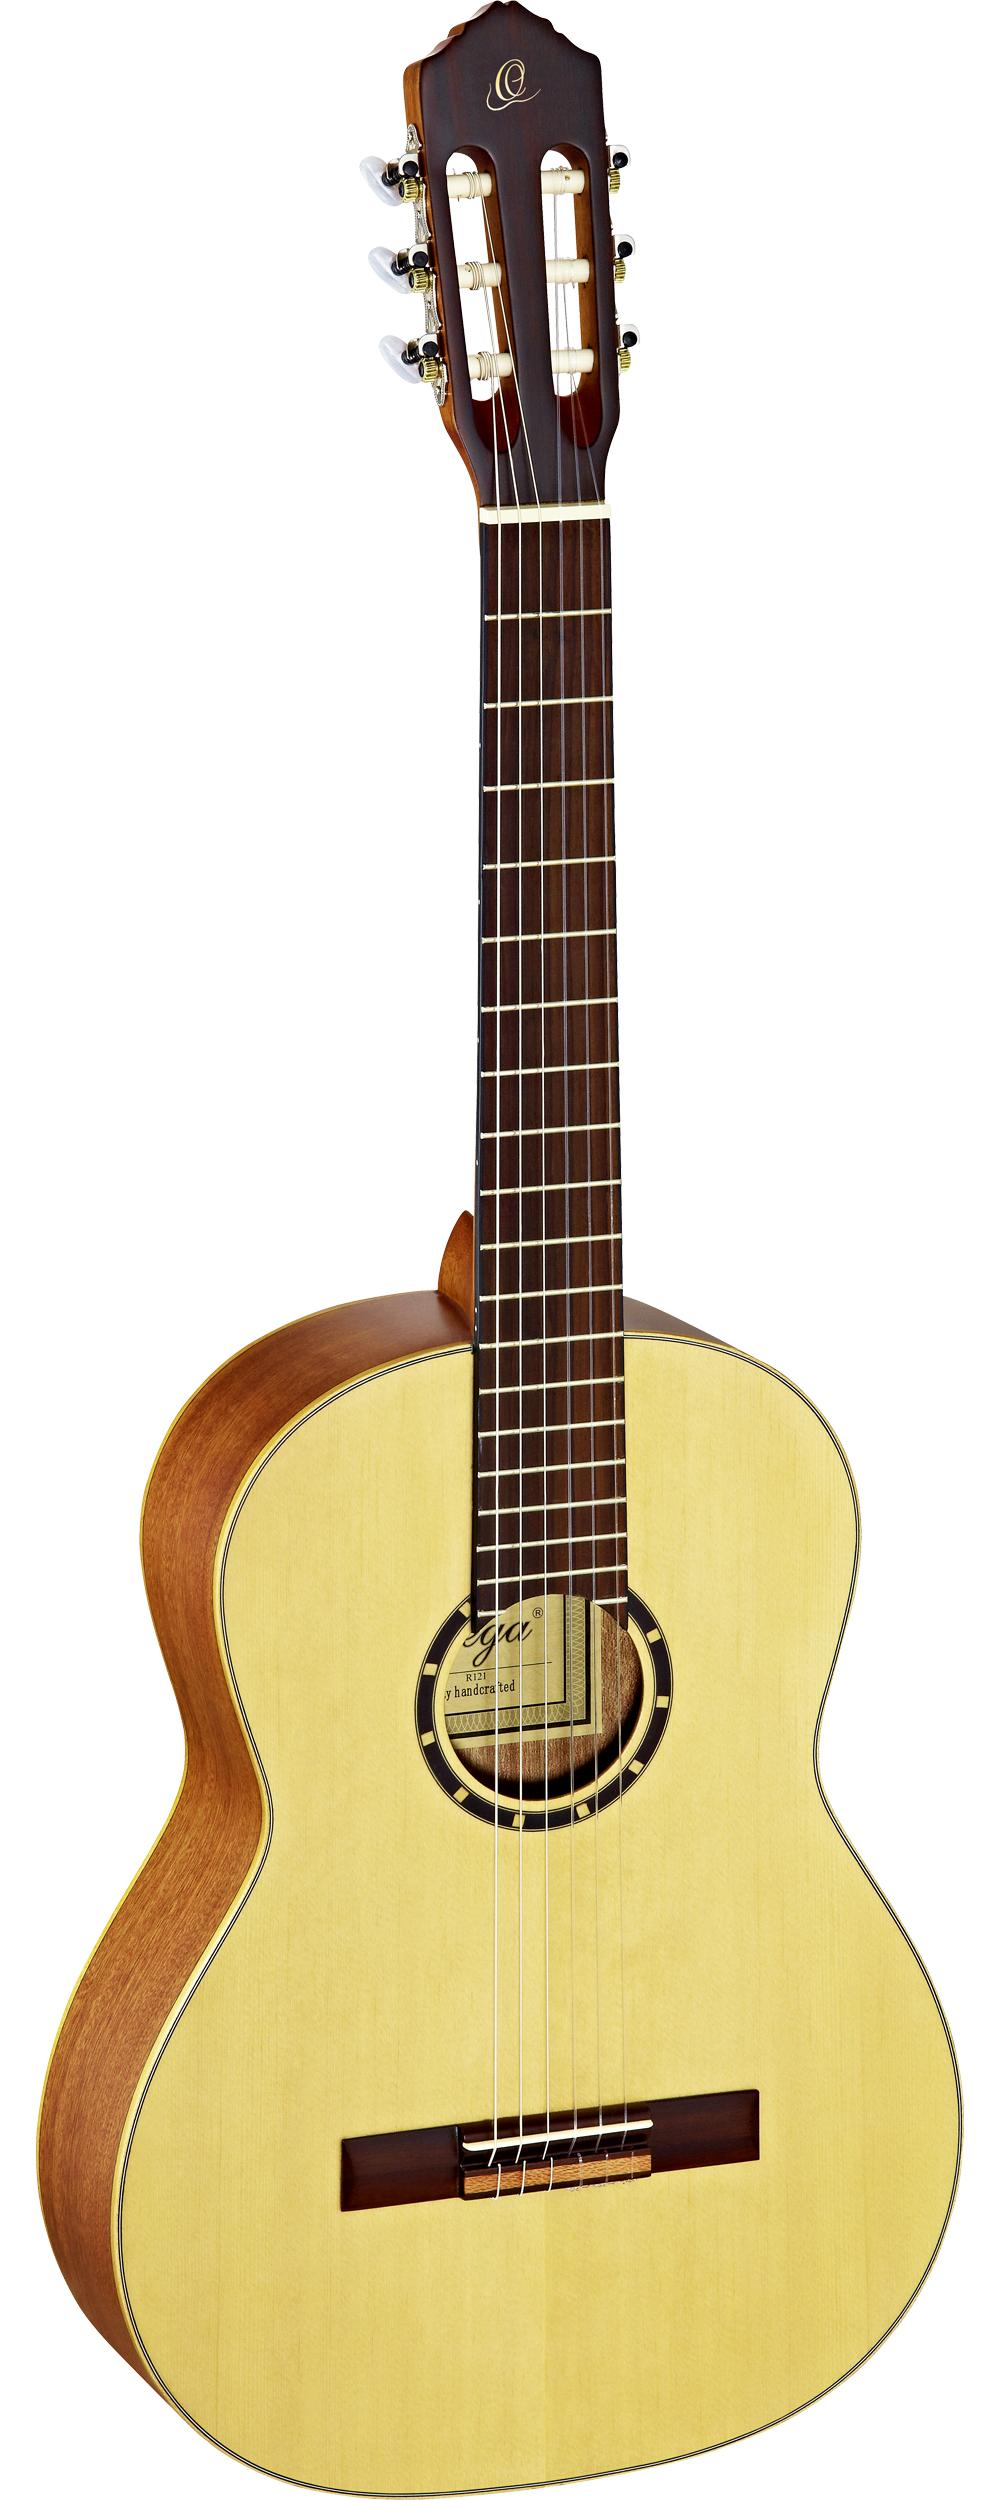 Ortega R 121 4/4 Konzertgitarre SN